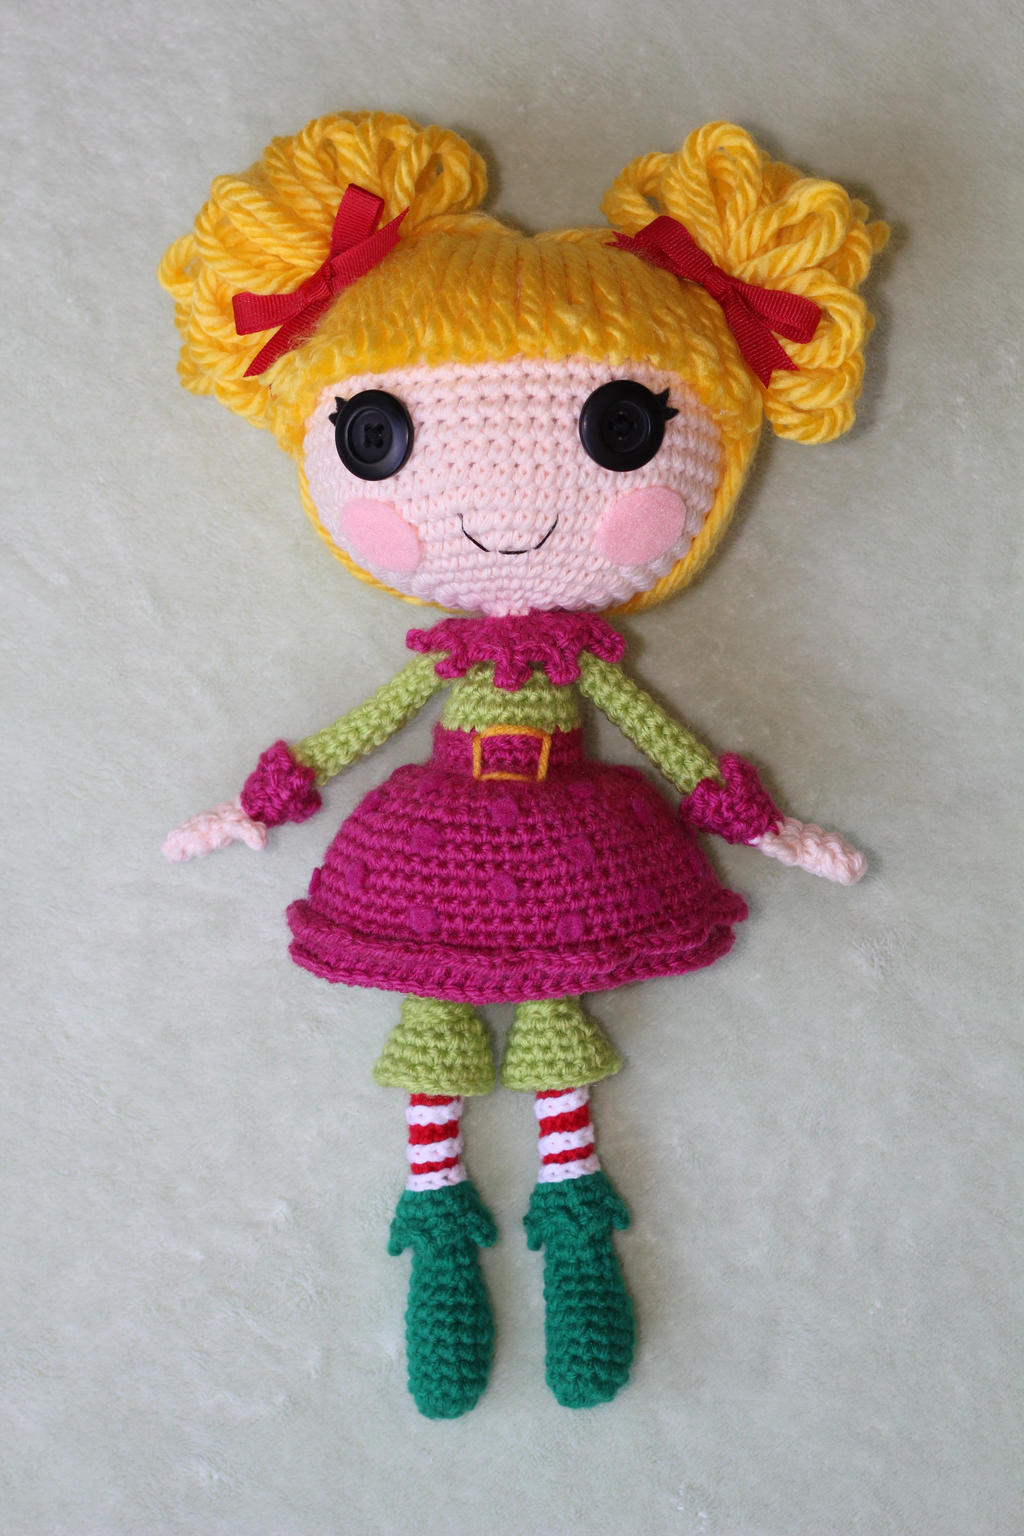 Crochet Wedding Dolls Pattern : LALALOOPSY Holly Sleighbells Amigurumi Doll by Npantz22 on ...